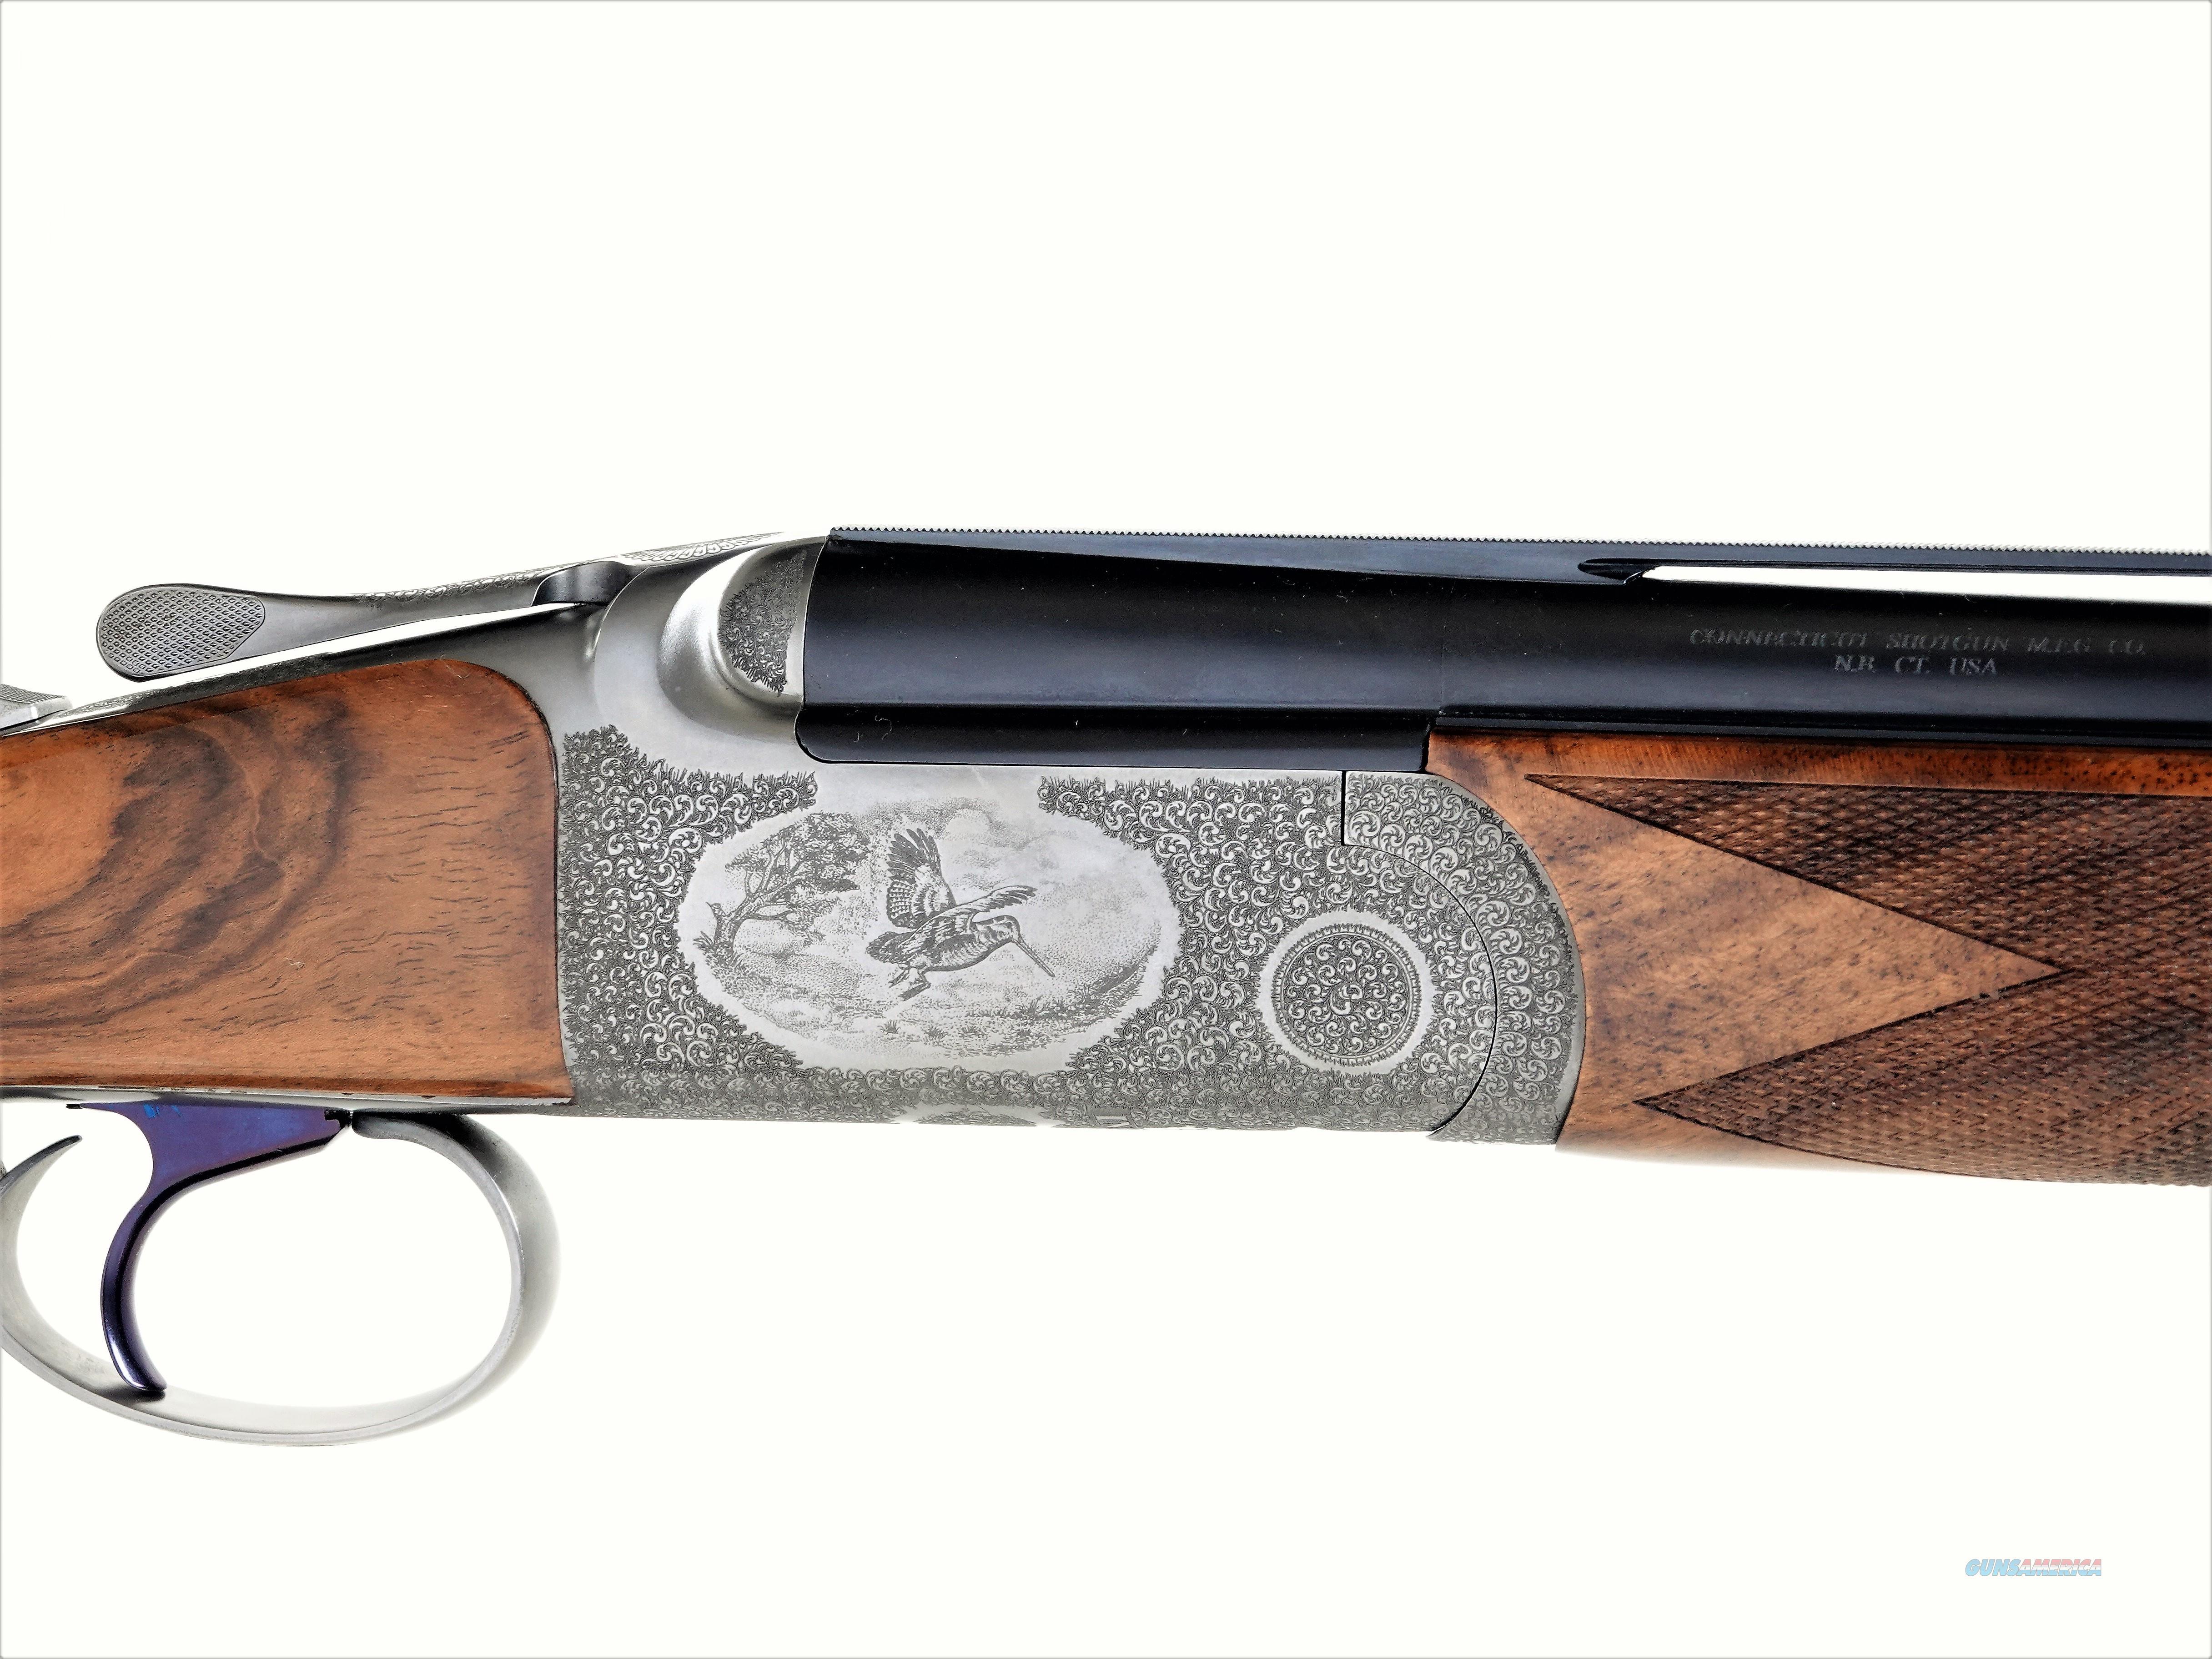 "CSMC Inverness - Special, Round Body, 20ga. 28"" Barrels #28690  Guns > Shotguns > Connecticut (Galazan) Shotguns"